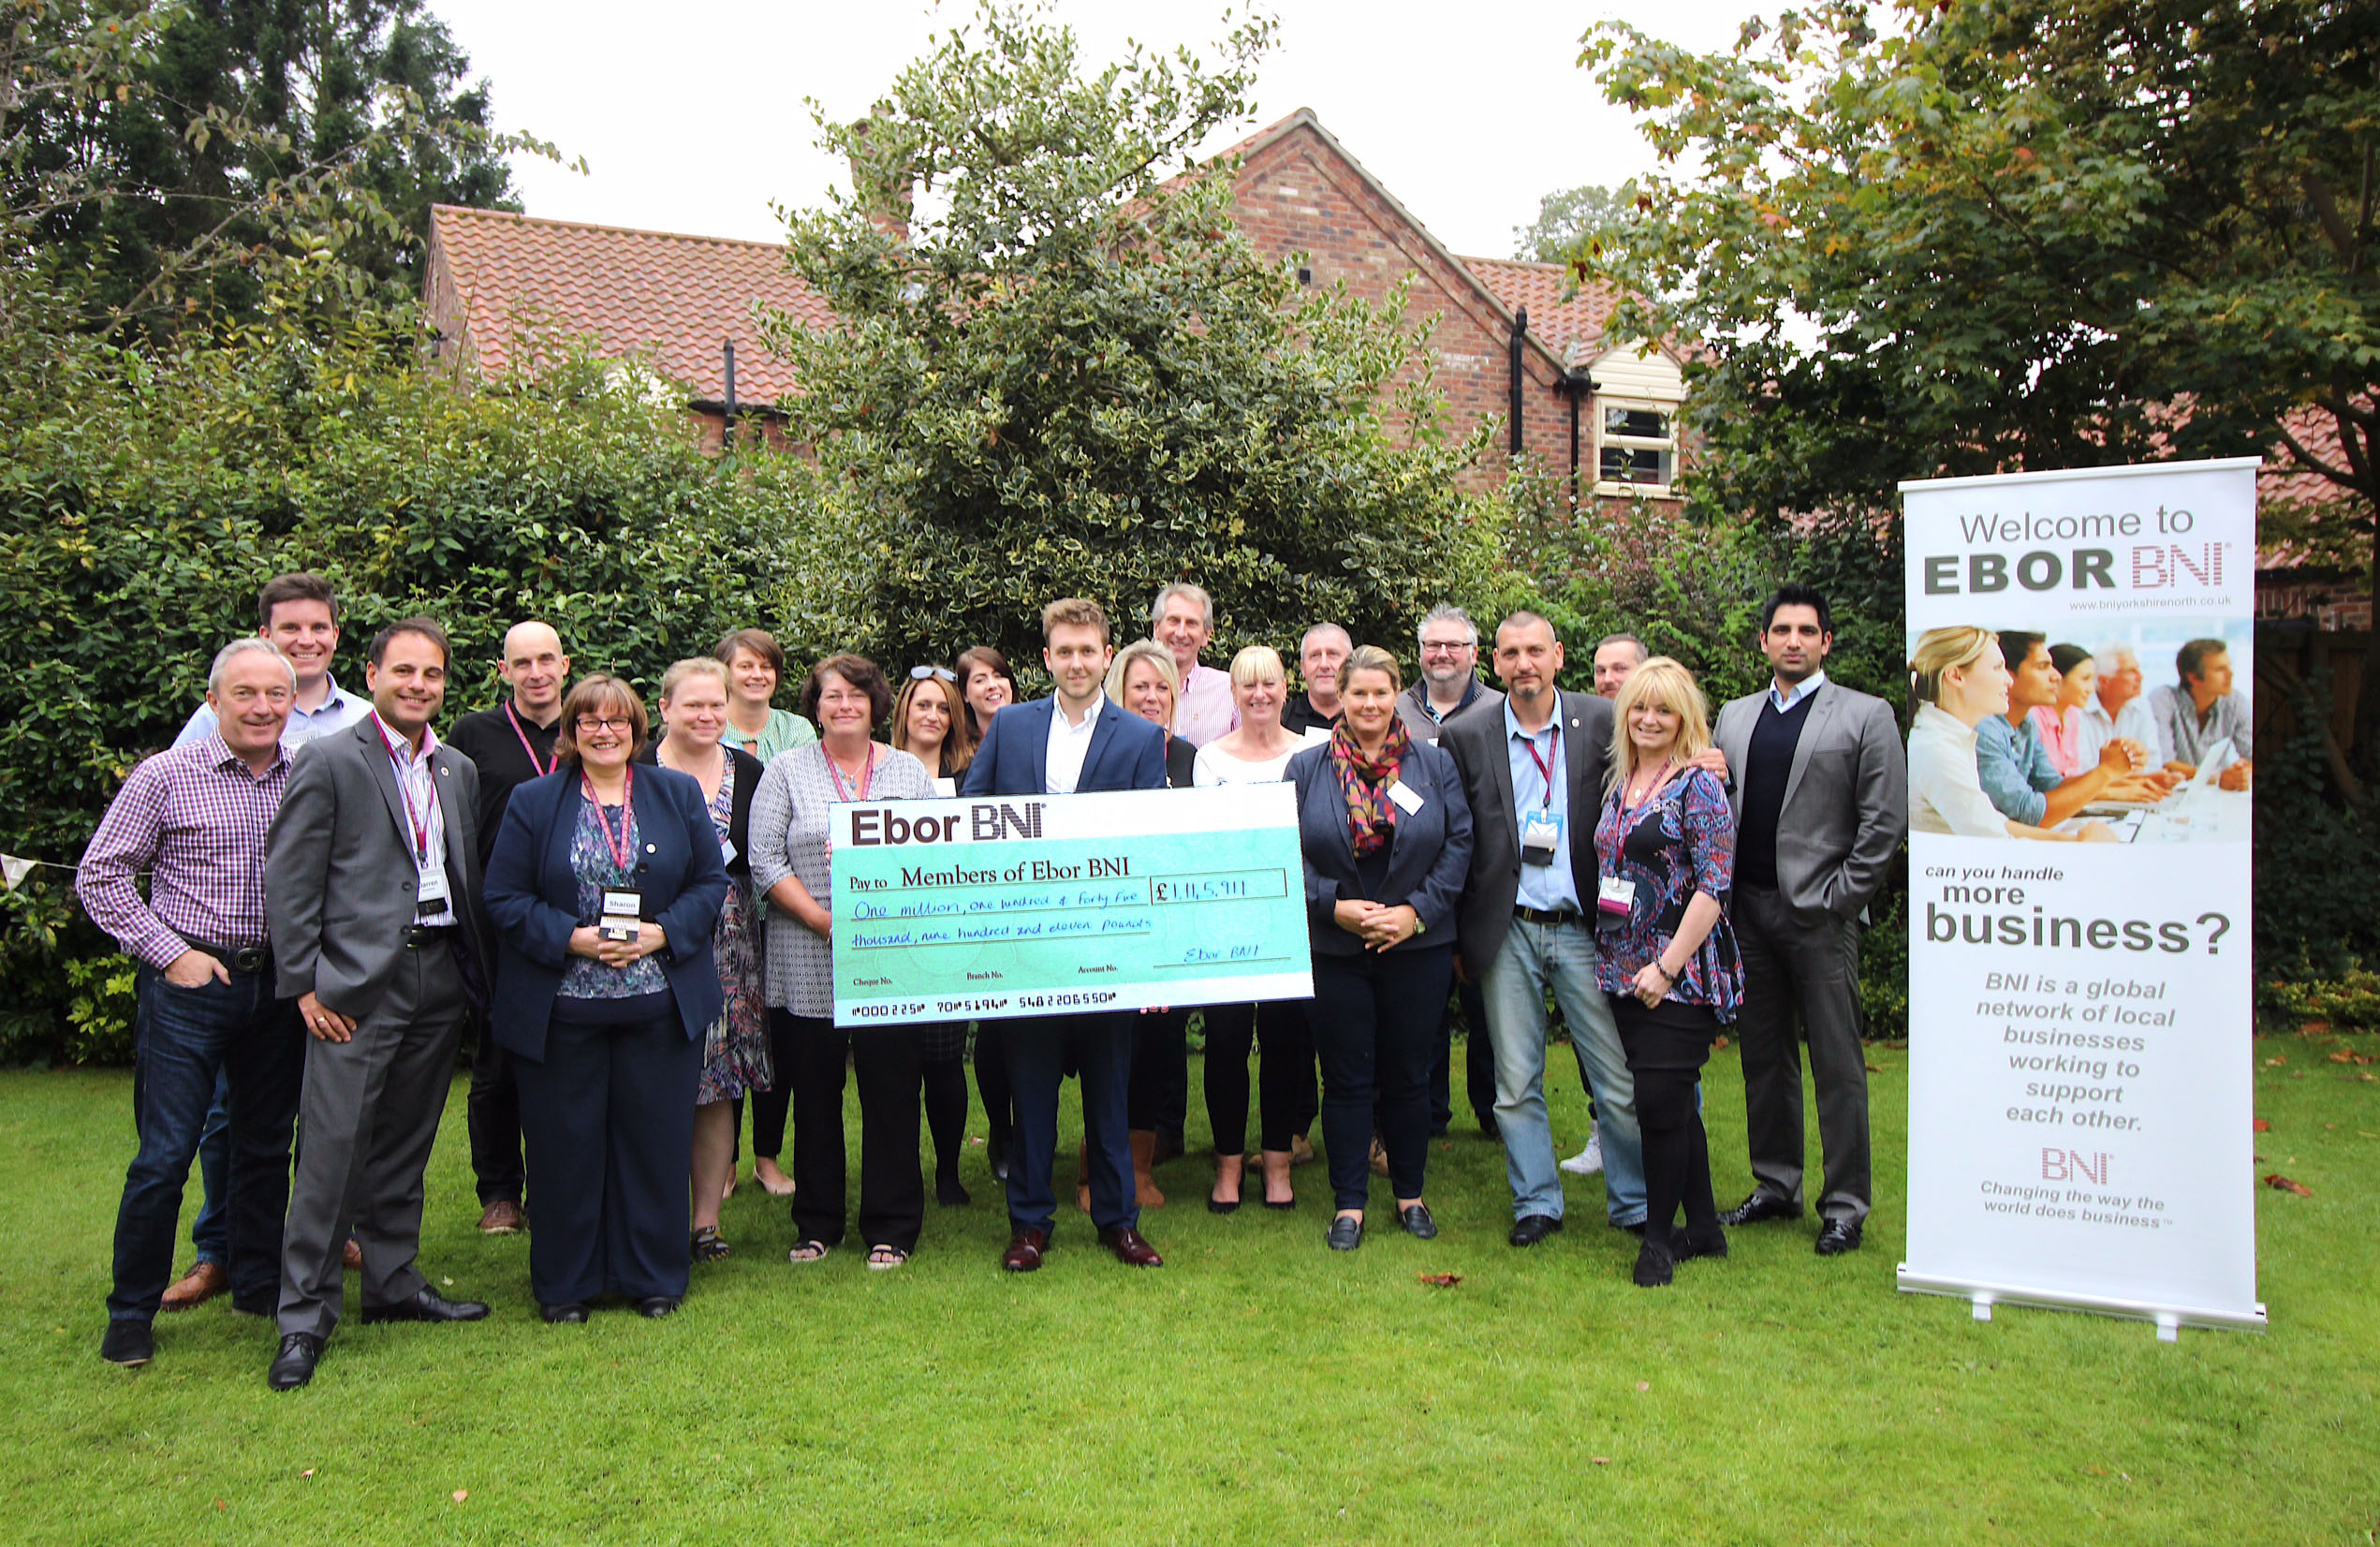 Ebor Members Celebrate 1 Million Pounds of Business